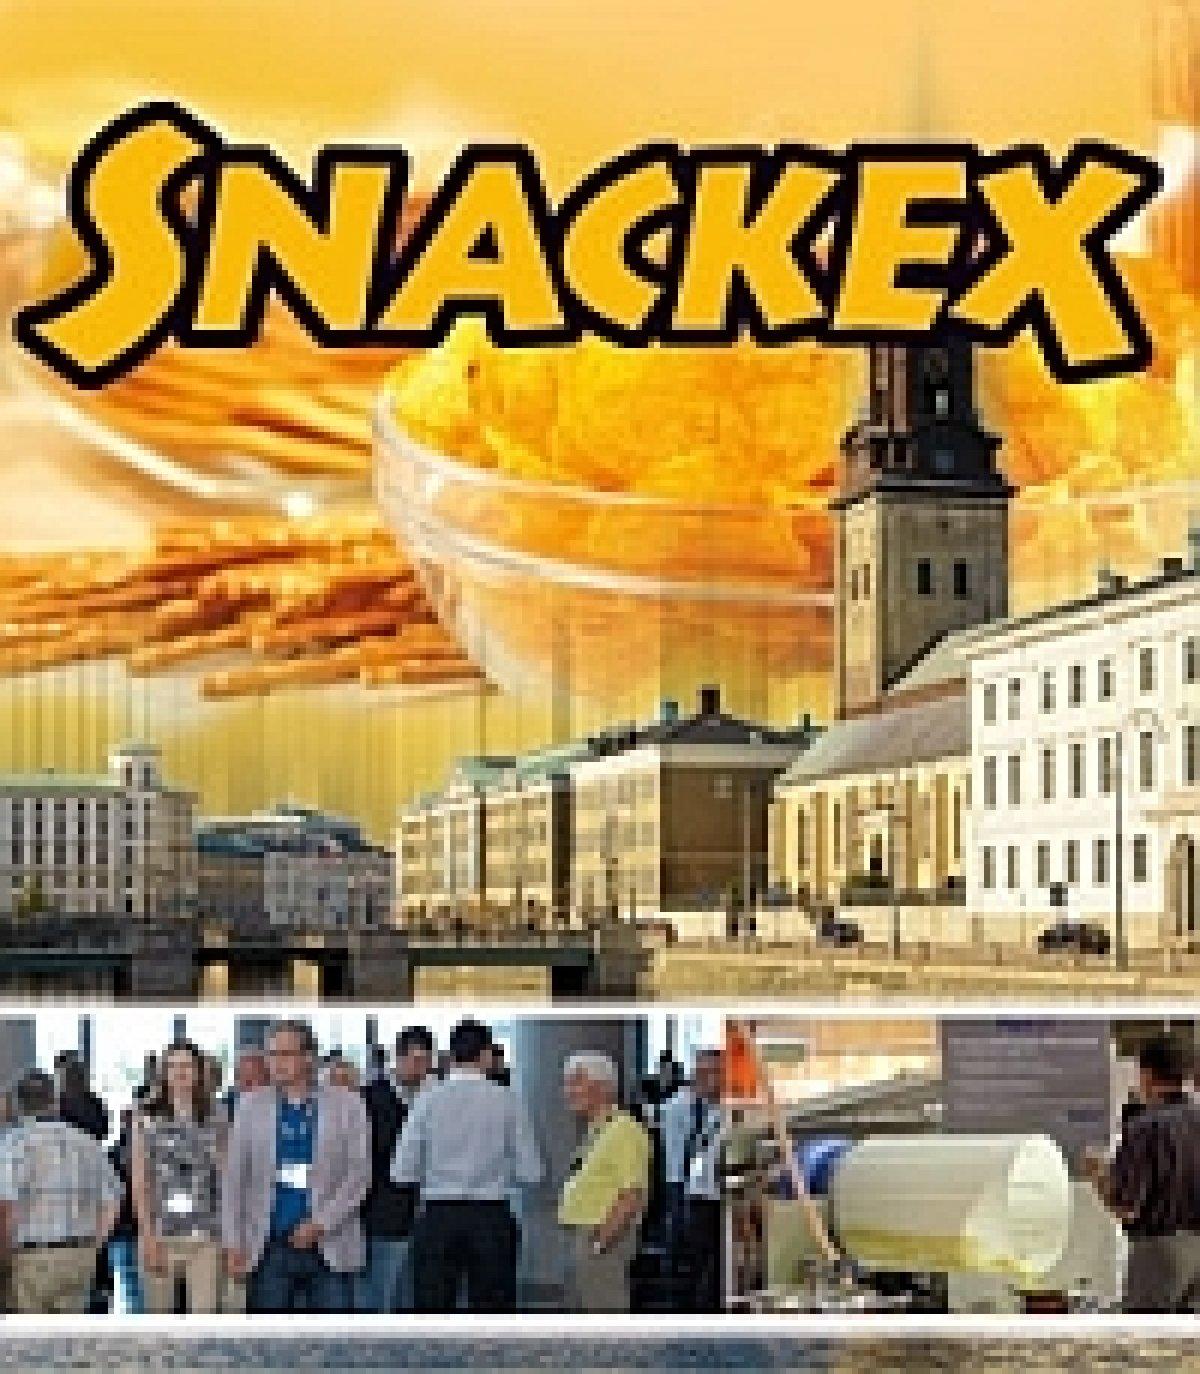 Snackex Spanish